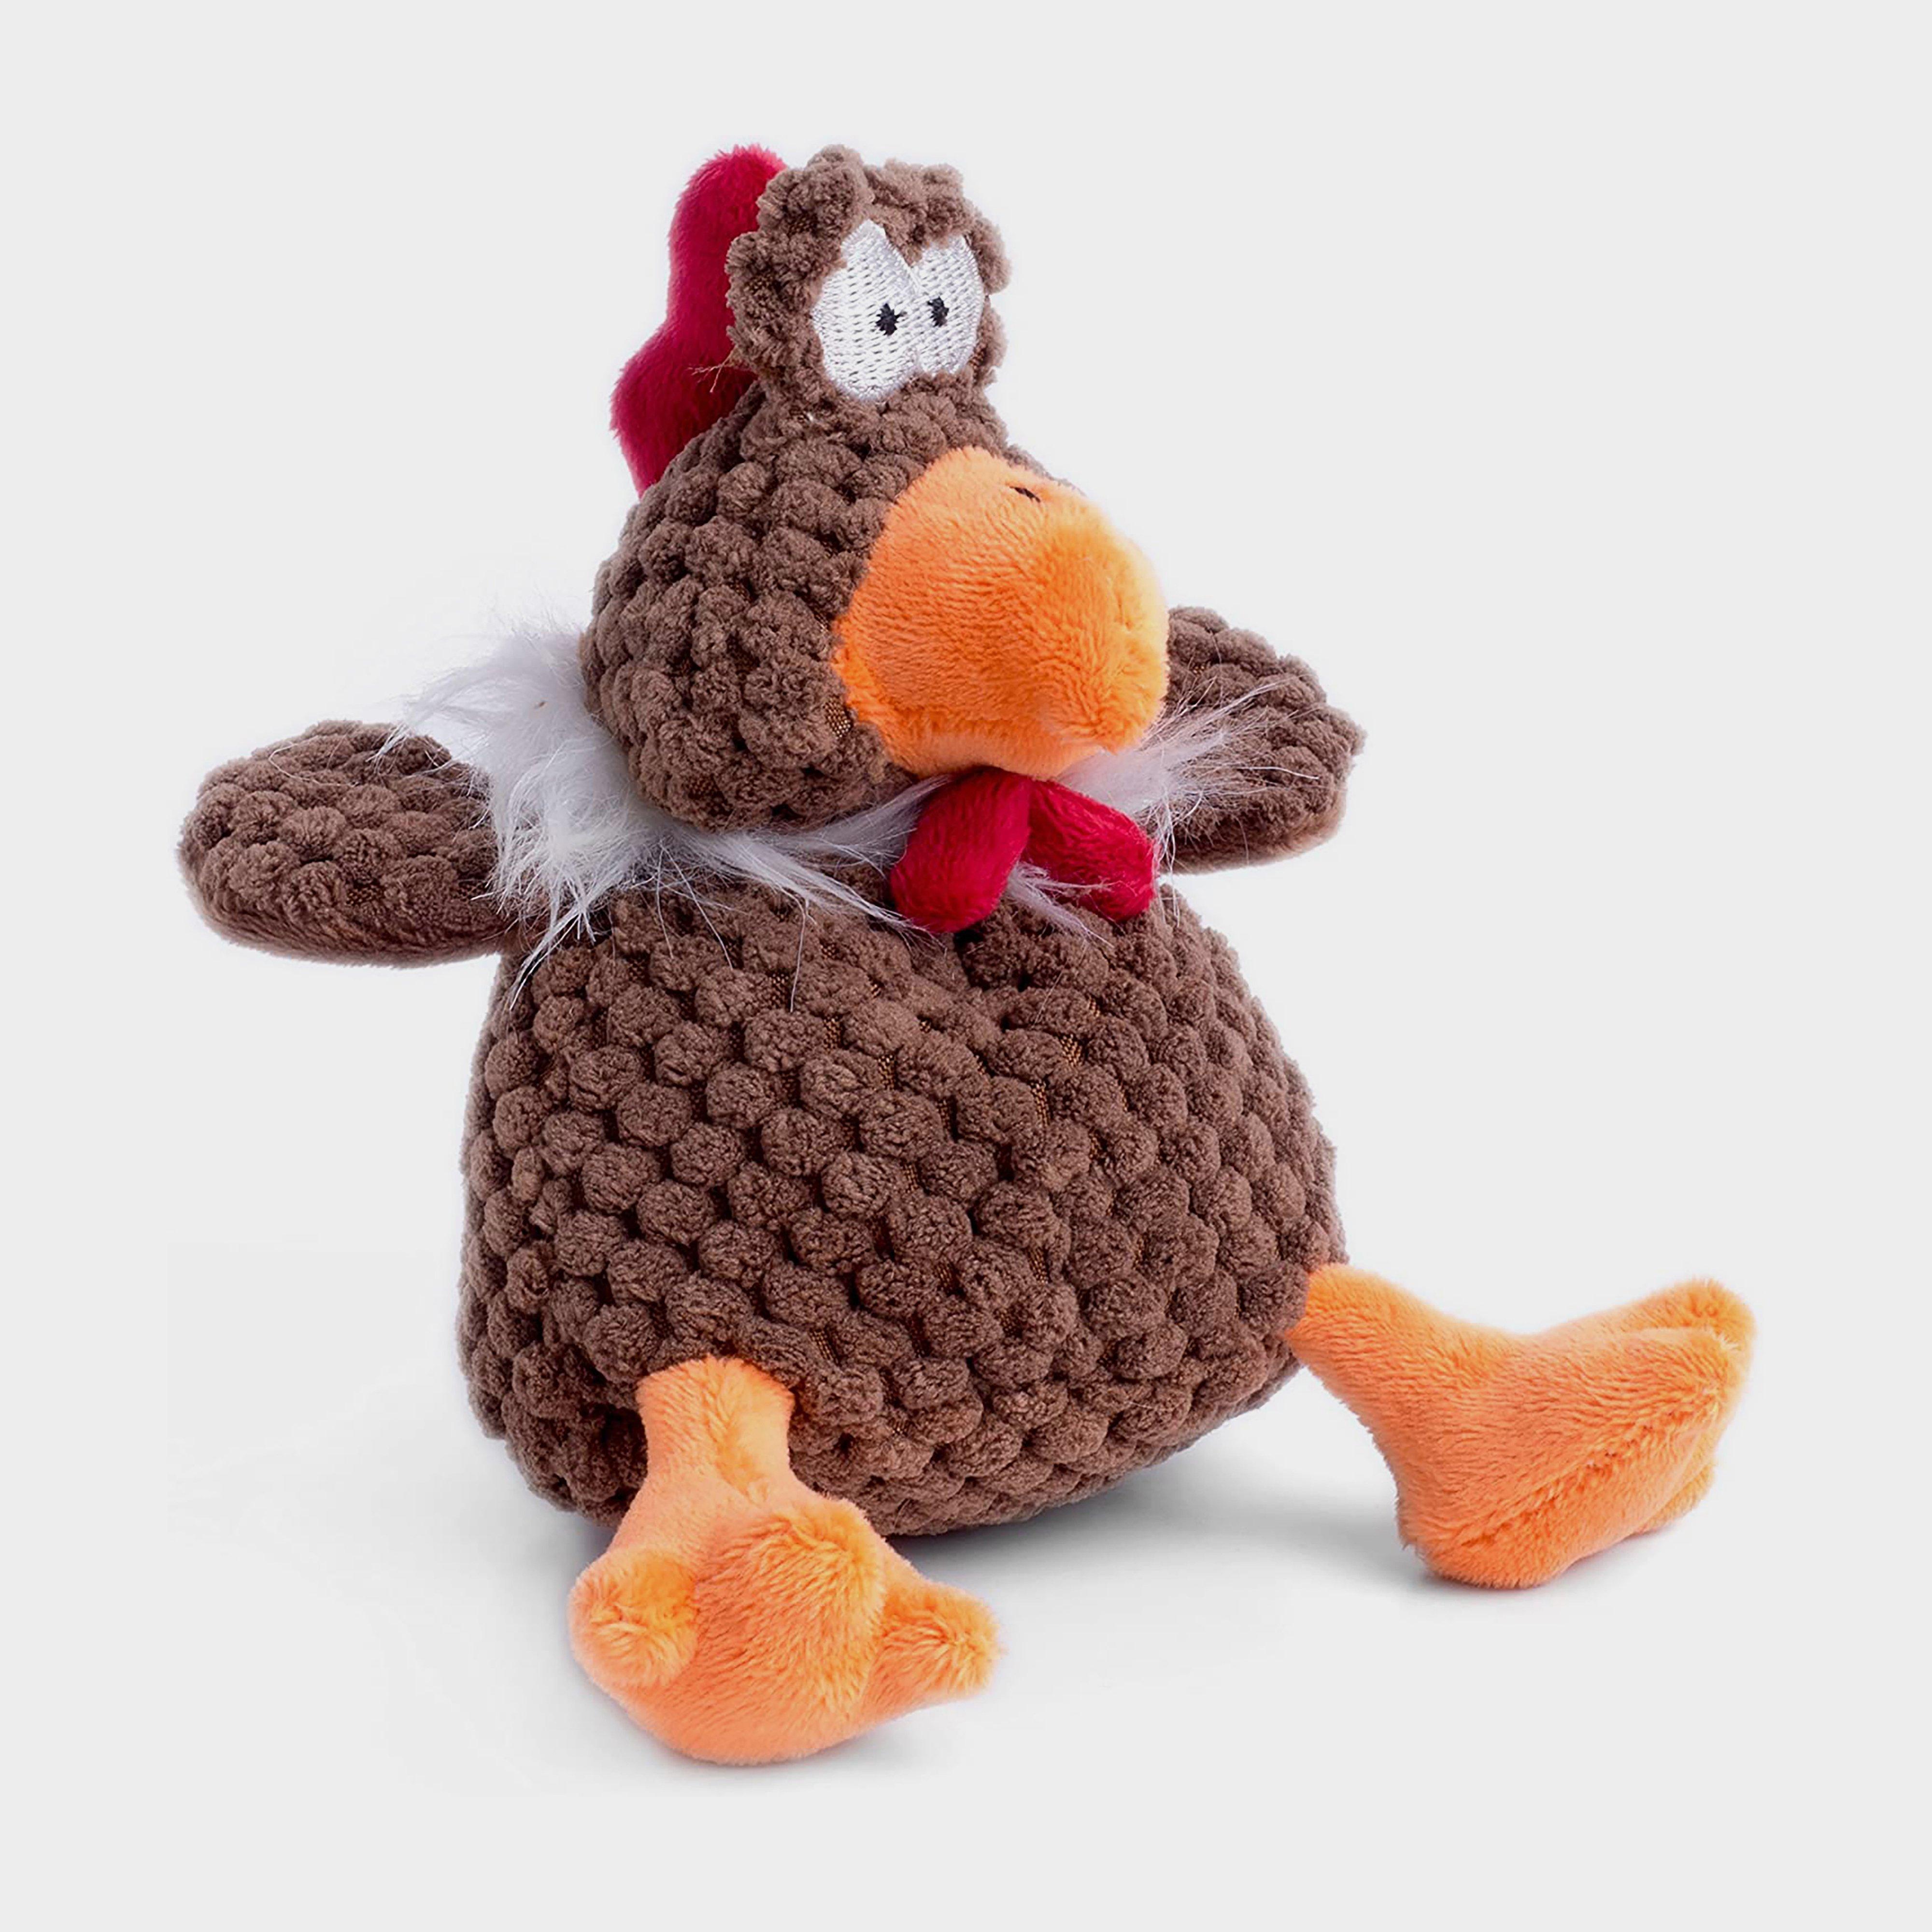 Image of Petface Farmyard Buddies Mini Chicken - Brown/Brown, BROWN/BROWN